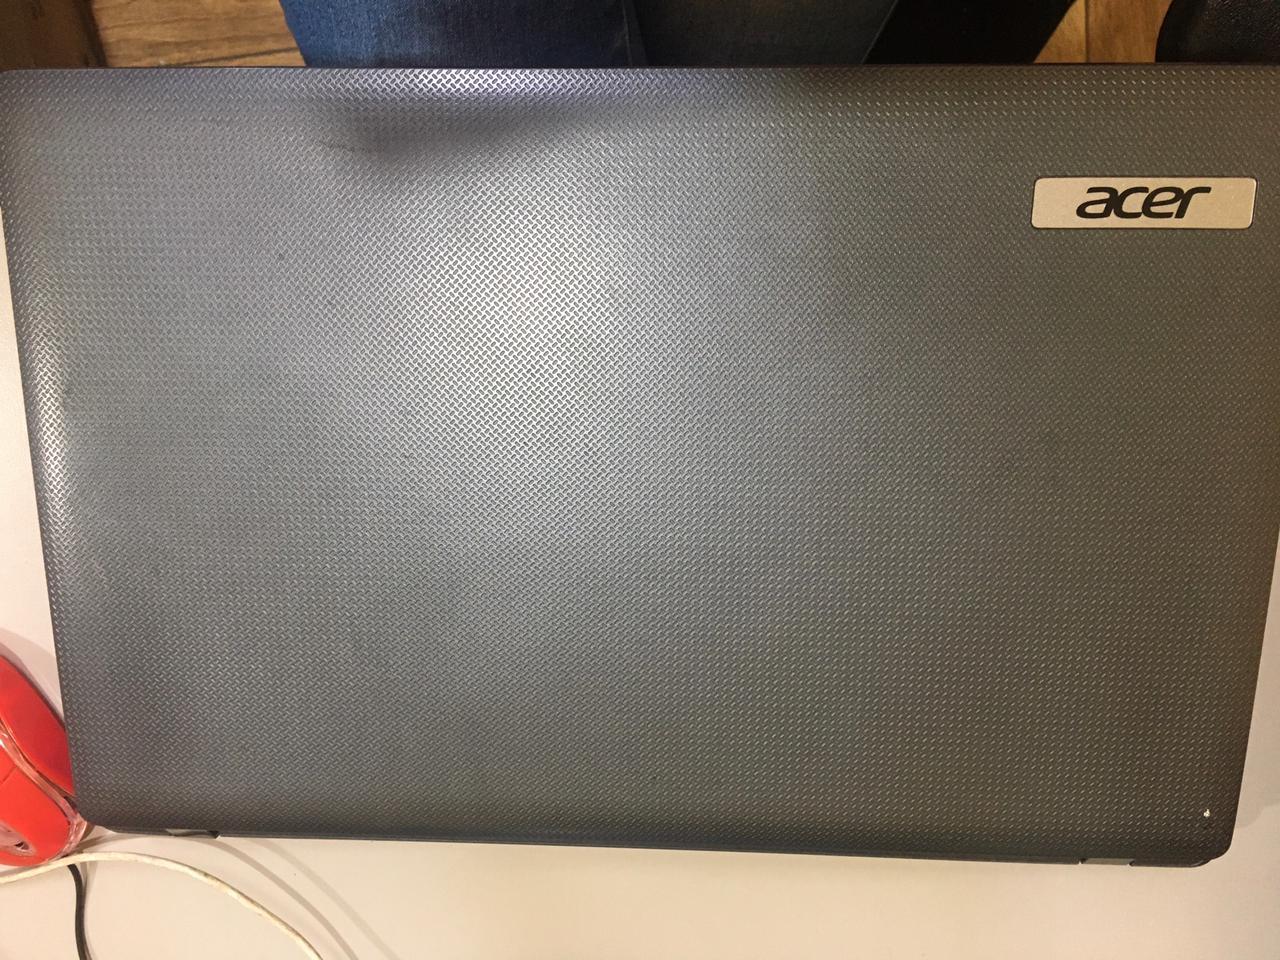 Notebook Acer 5733 i3 2gb 320gb